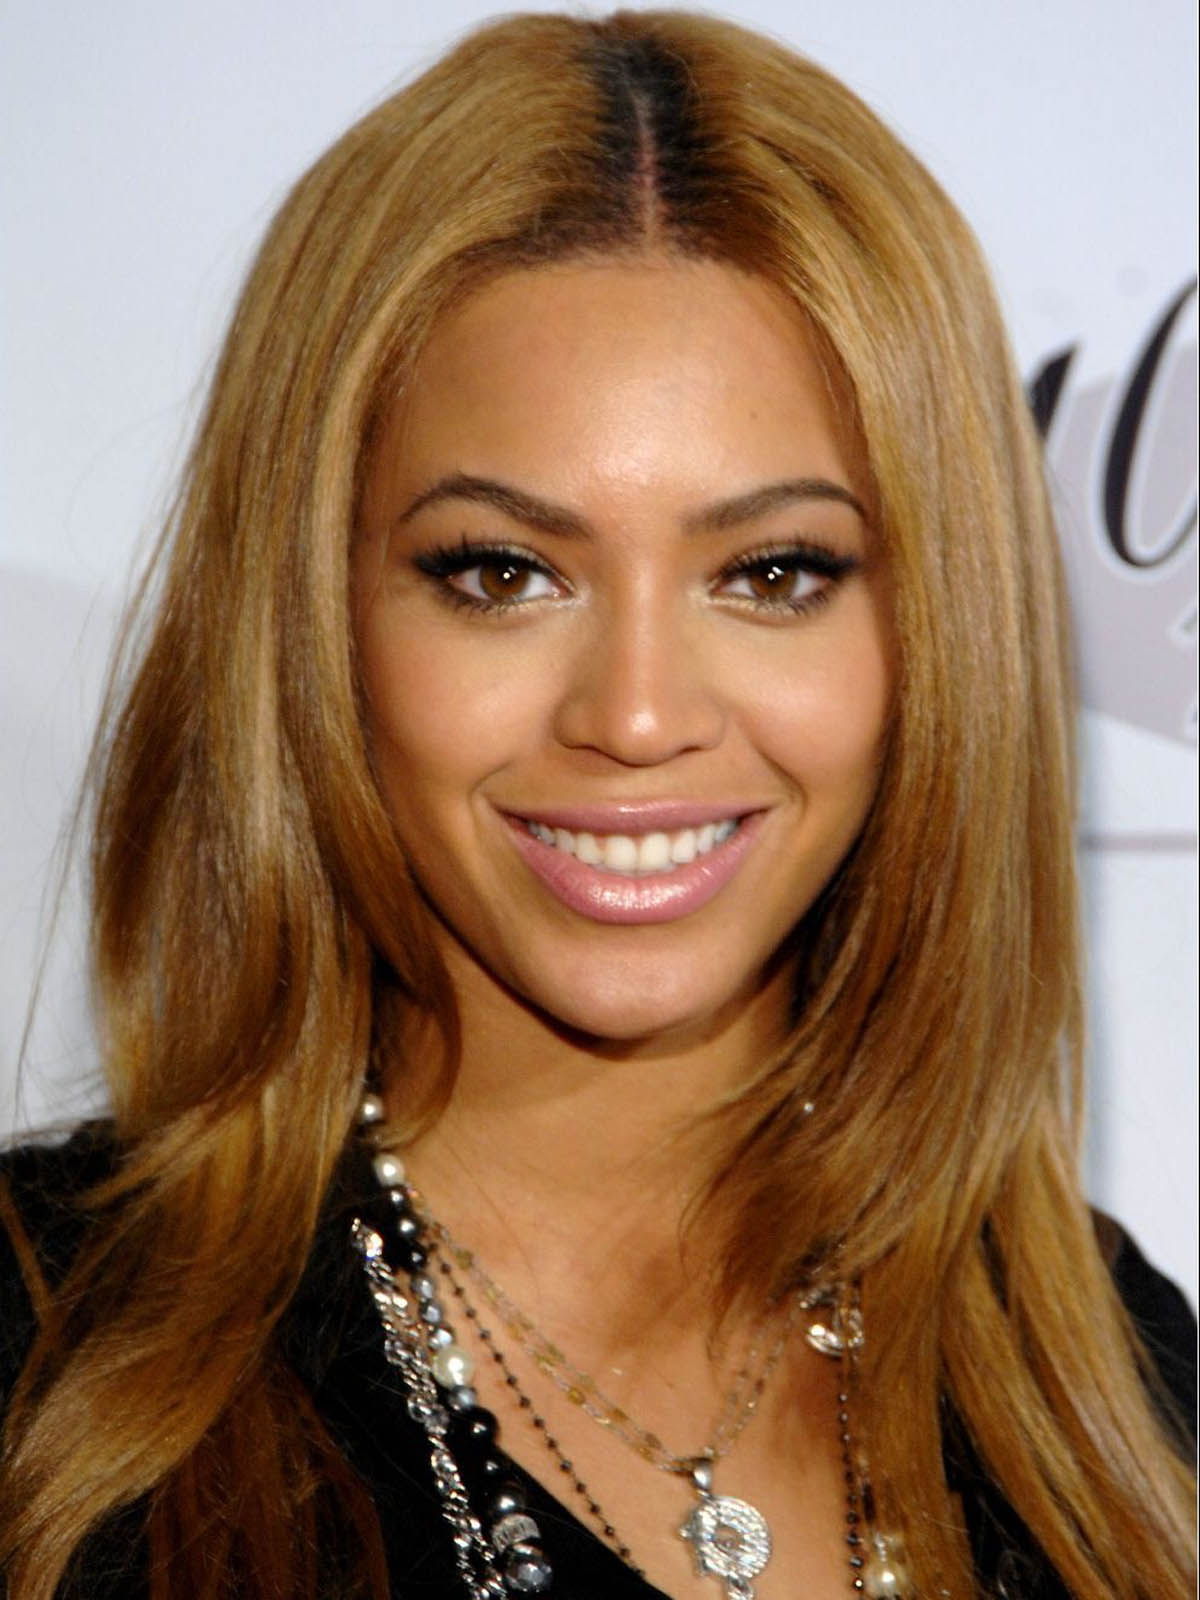 http://2.bp.blogspot.com/-XOpnDMsAzIU/USsn22KffbI/AAAAAAAAGus/e18I4F47olA/s1600/Beyonce+Knowles+Hot+Photos+(3).jpg